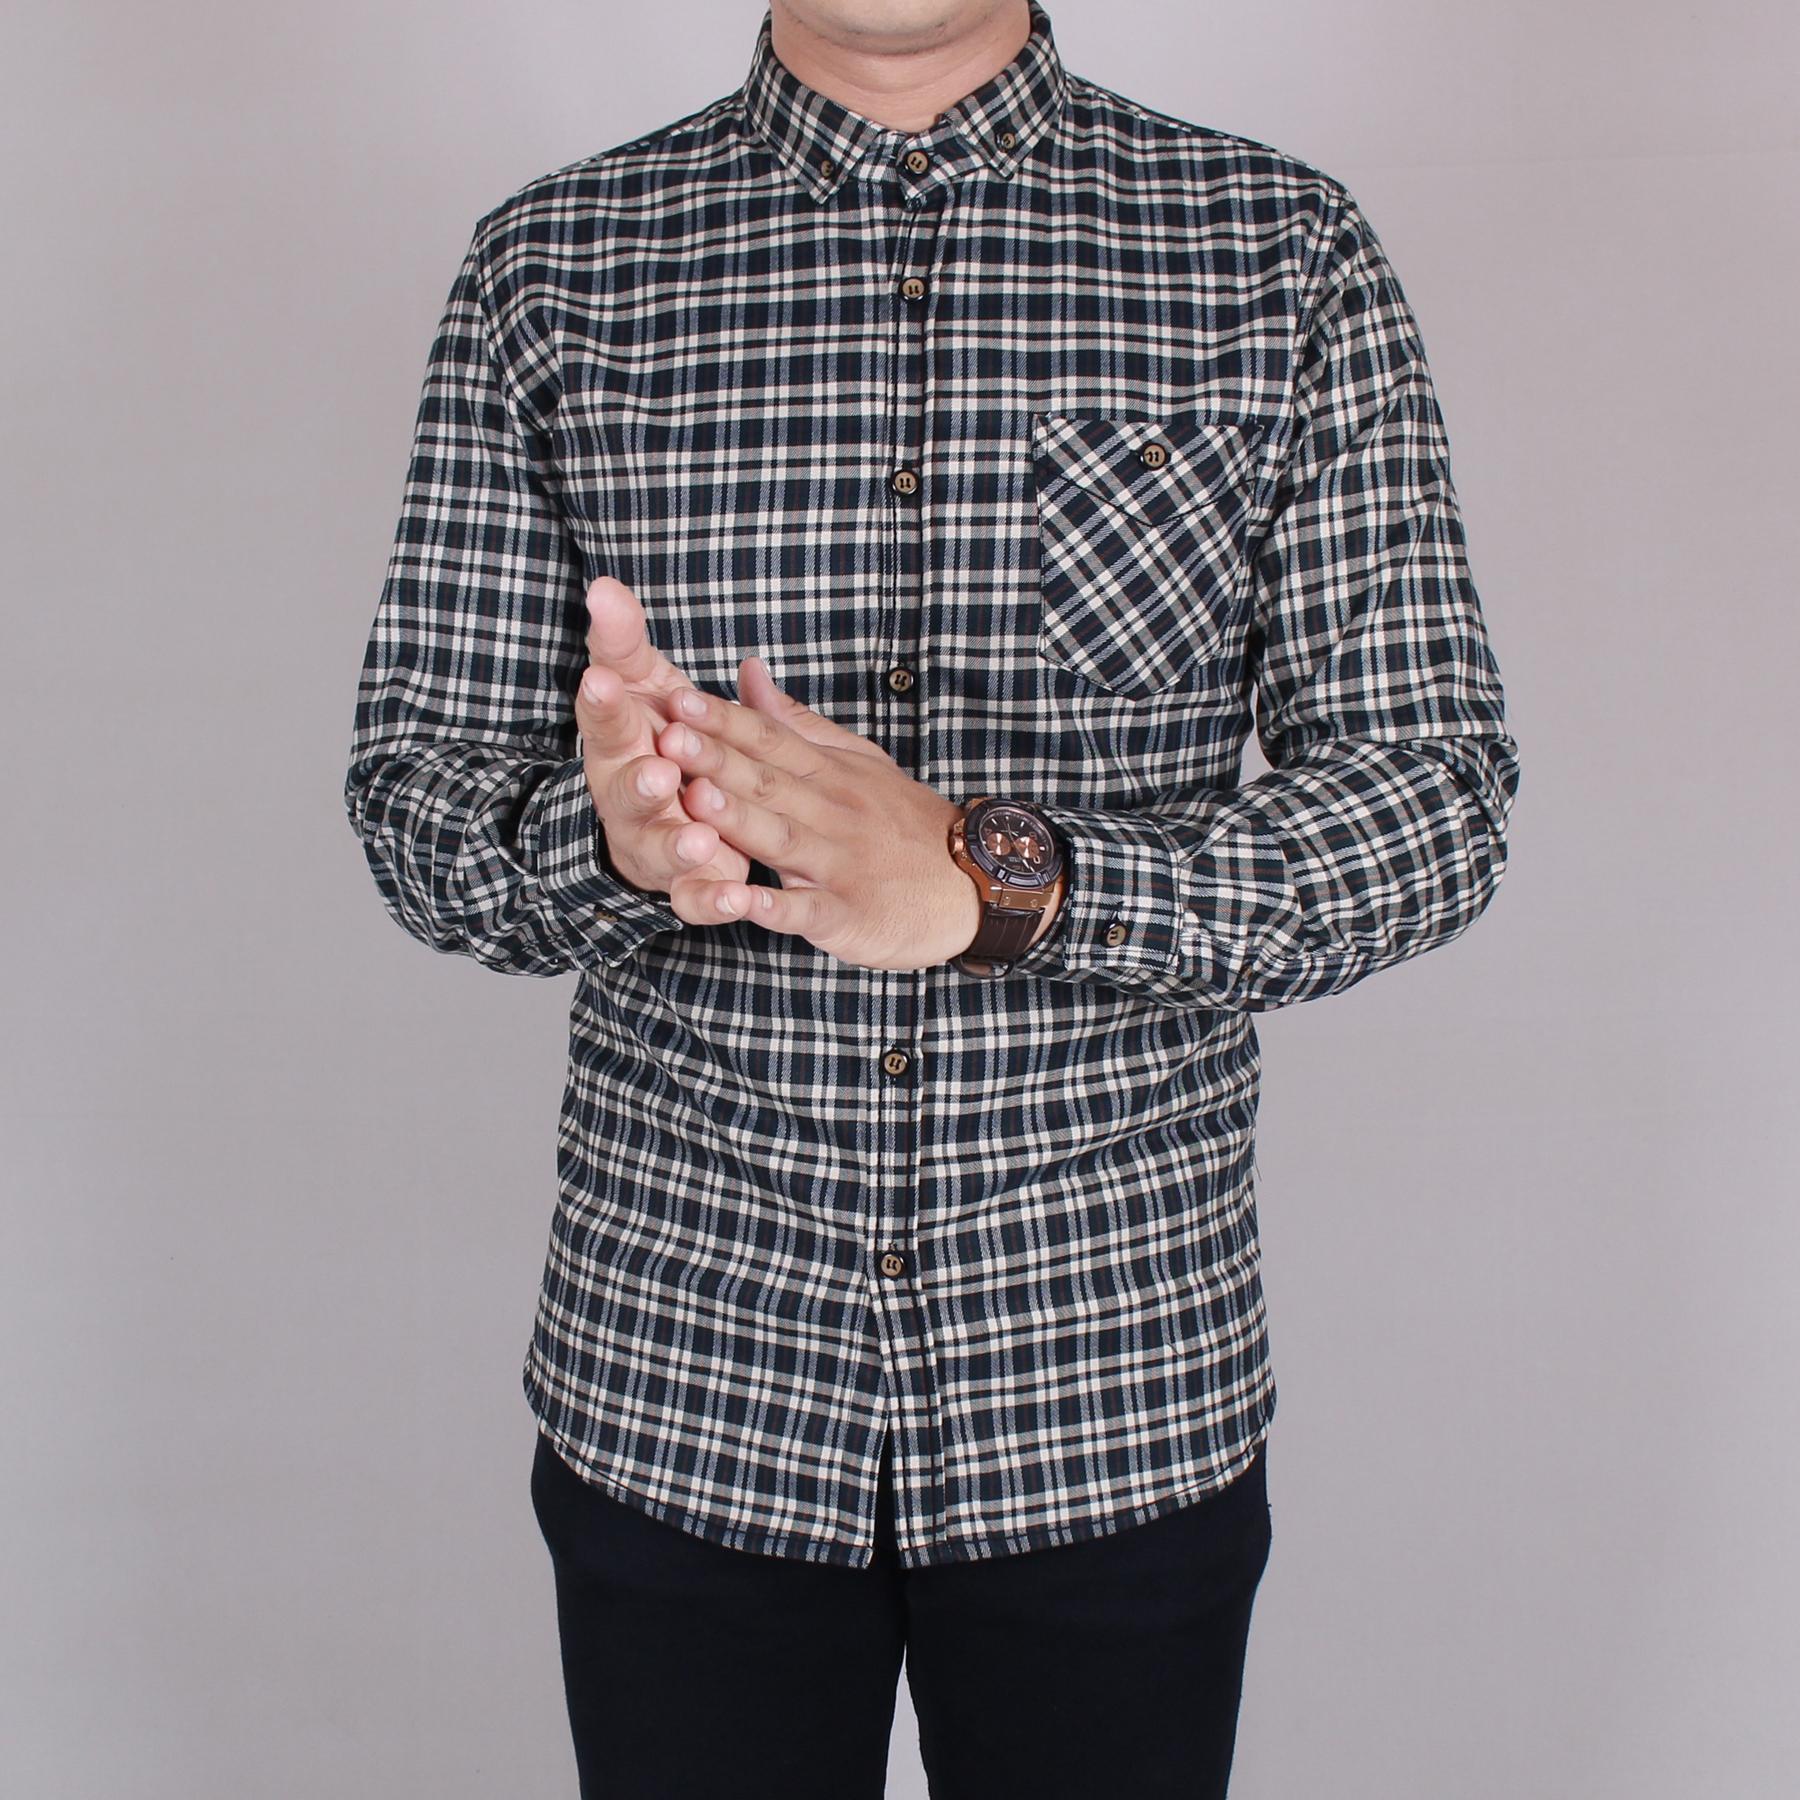 Zs_Fashion 6030 Kemeja Flanel Pria Lengan Panjang Exclusive Baju Kemeja Flanel Cowok Kerja Kantoran